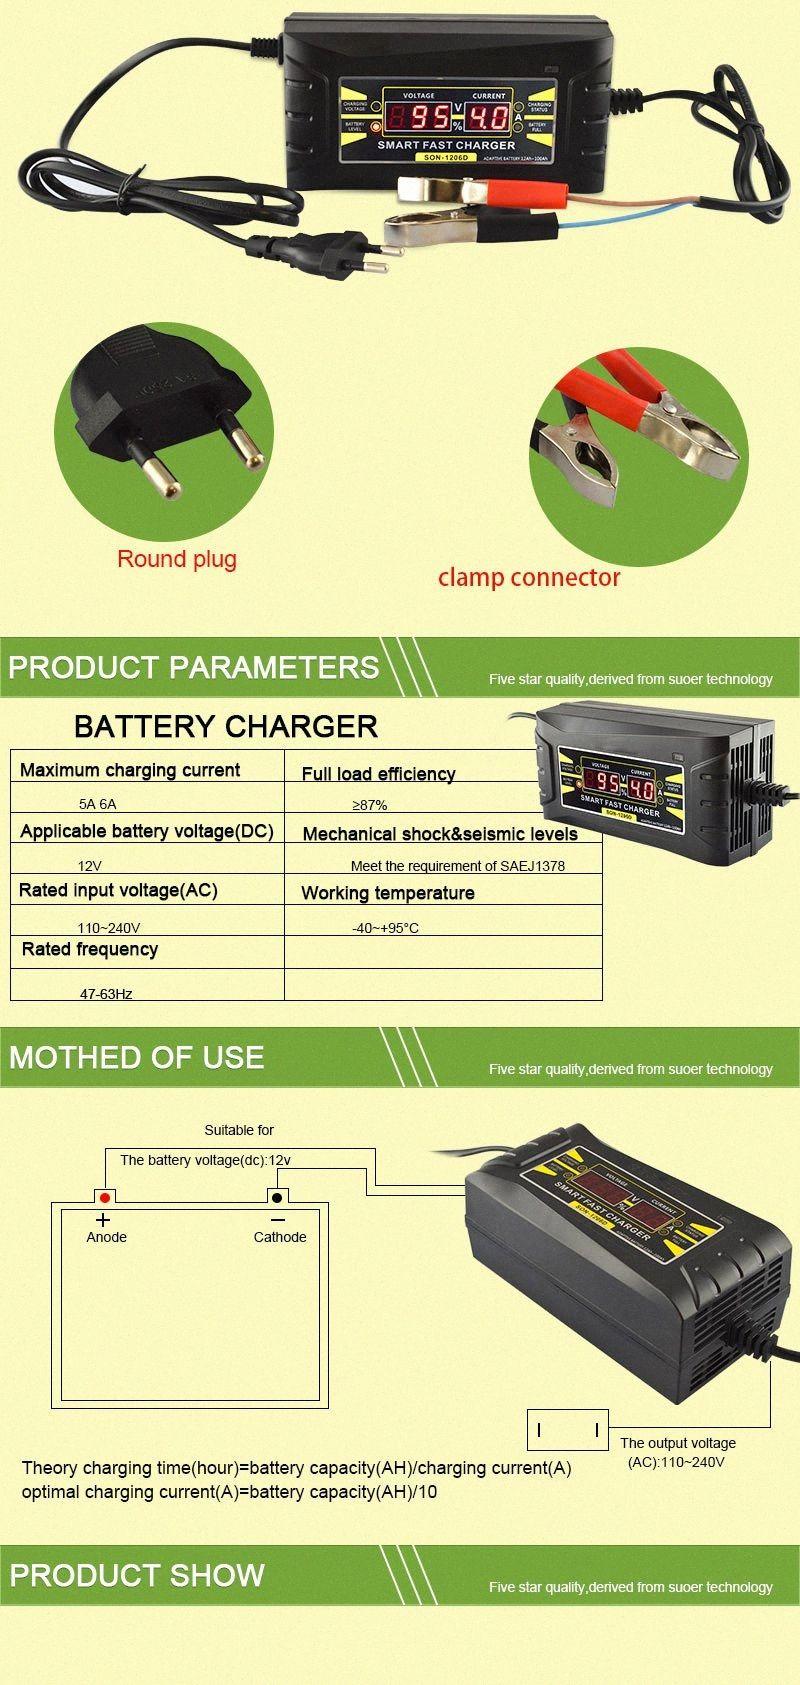 Automatische Smart Battery Charger 12V 5A EU / US-Maintainer Desulfator für Blei-Säure-Batterien Auto-Ladegerät 110 240V Wechselstrom-Eingang Auto P 22LW #